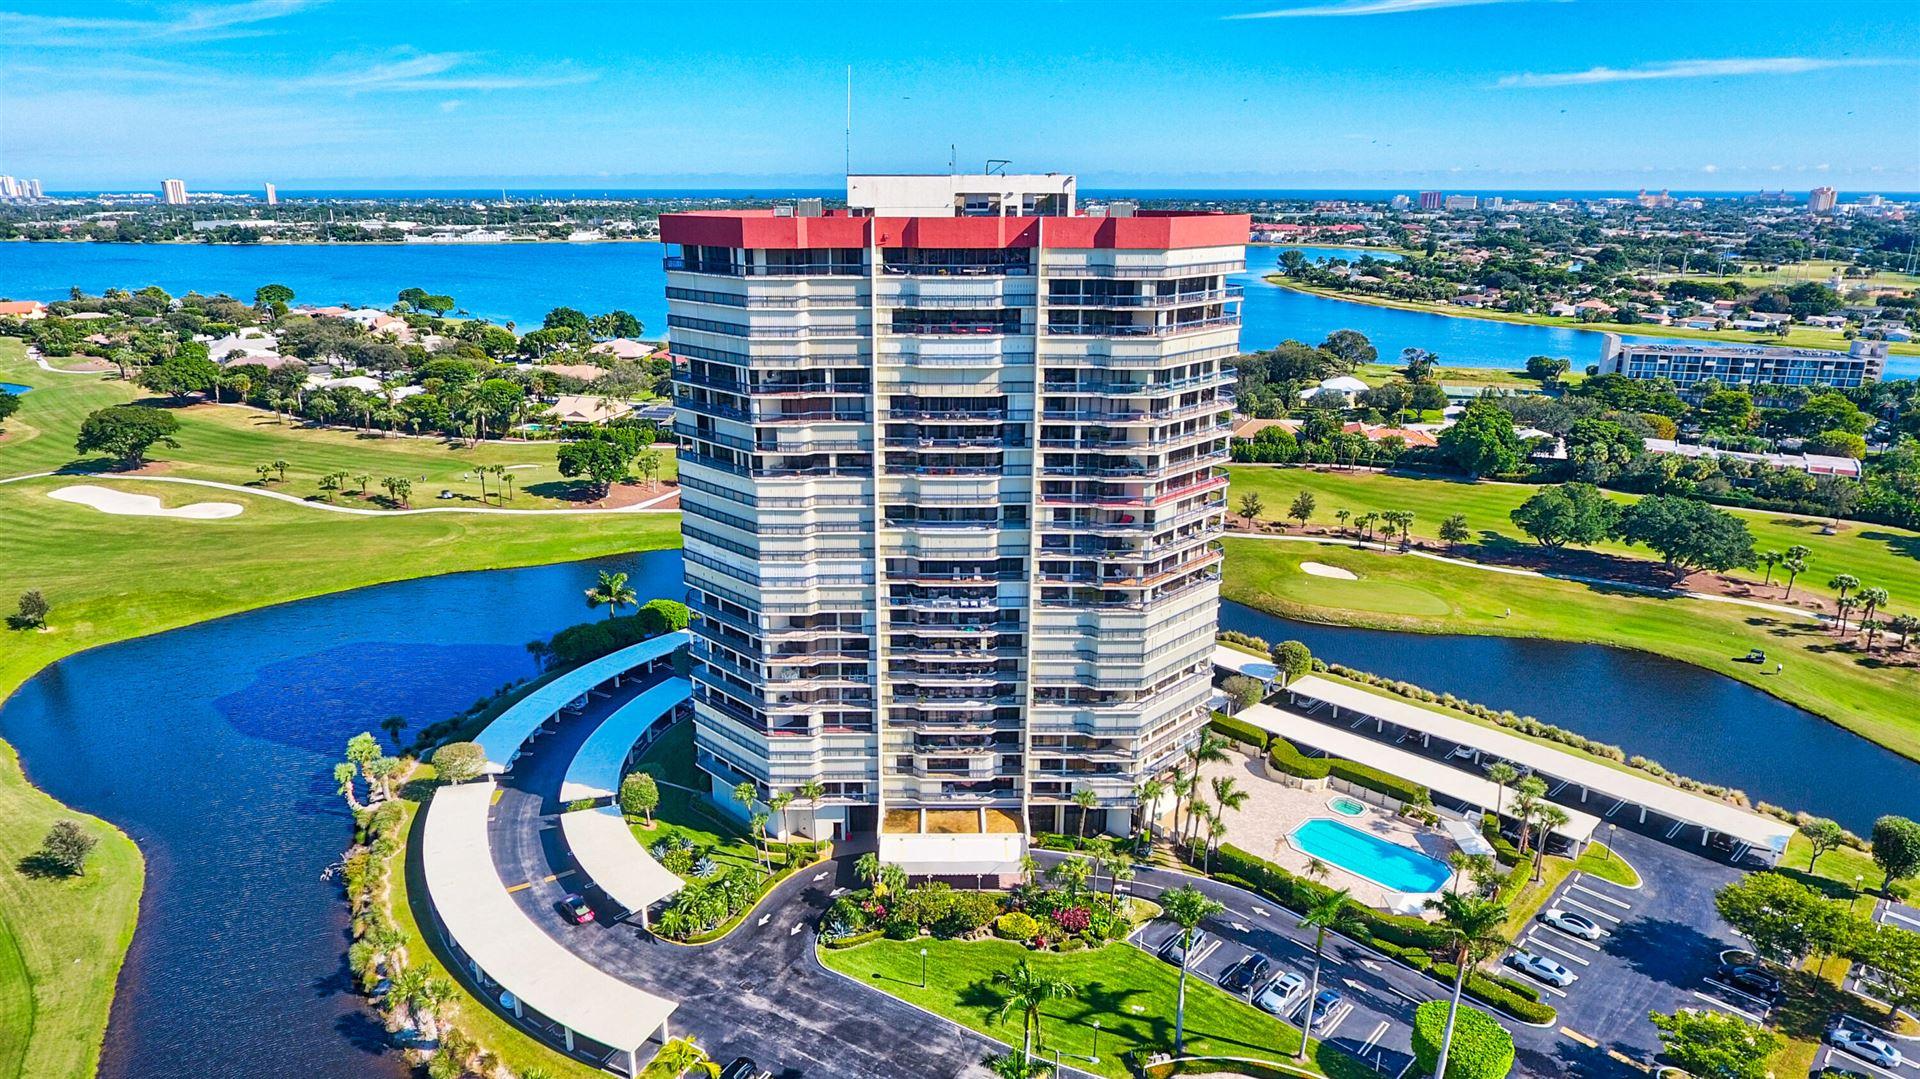 1900 Consulate Place #405, West Palm Beach, FL 33401 - MLS#: RX-10749060